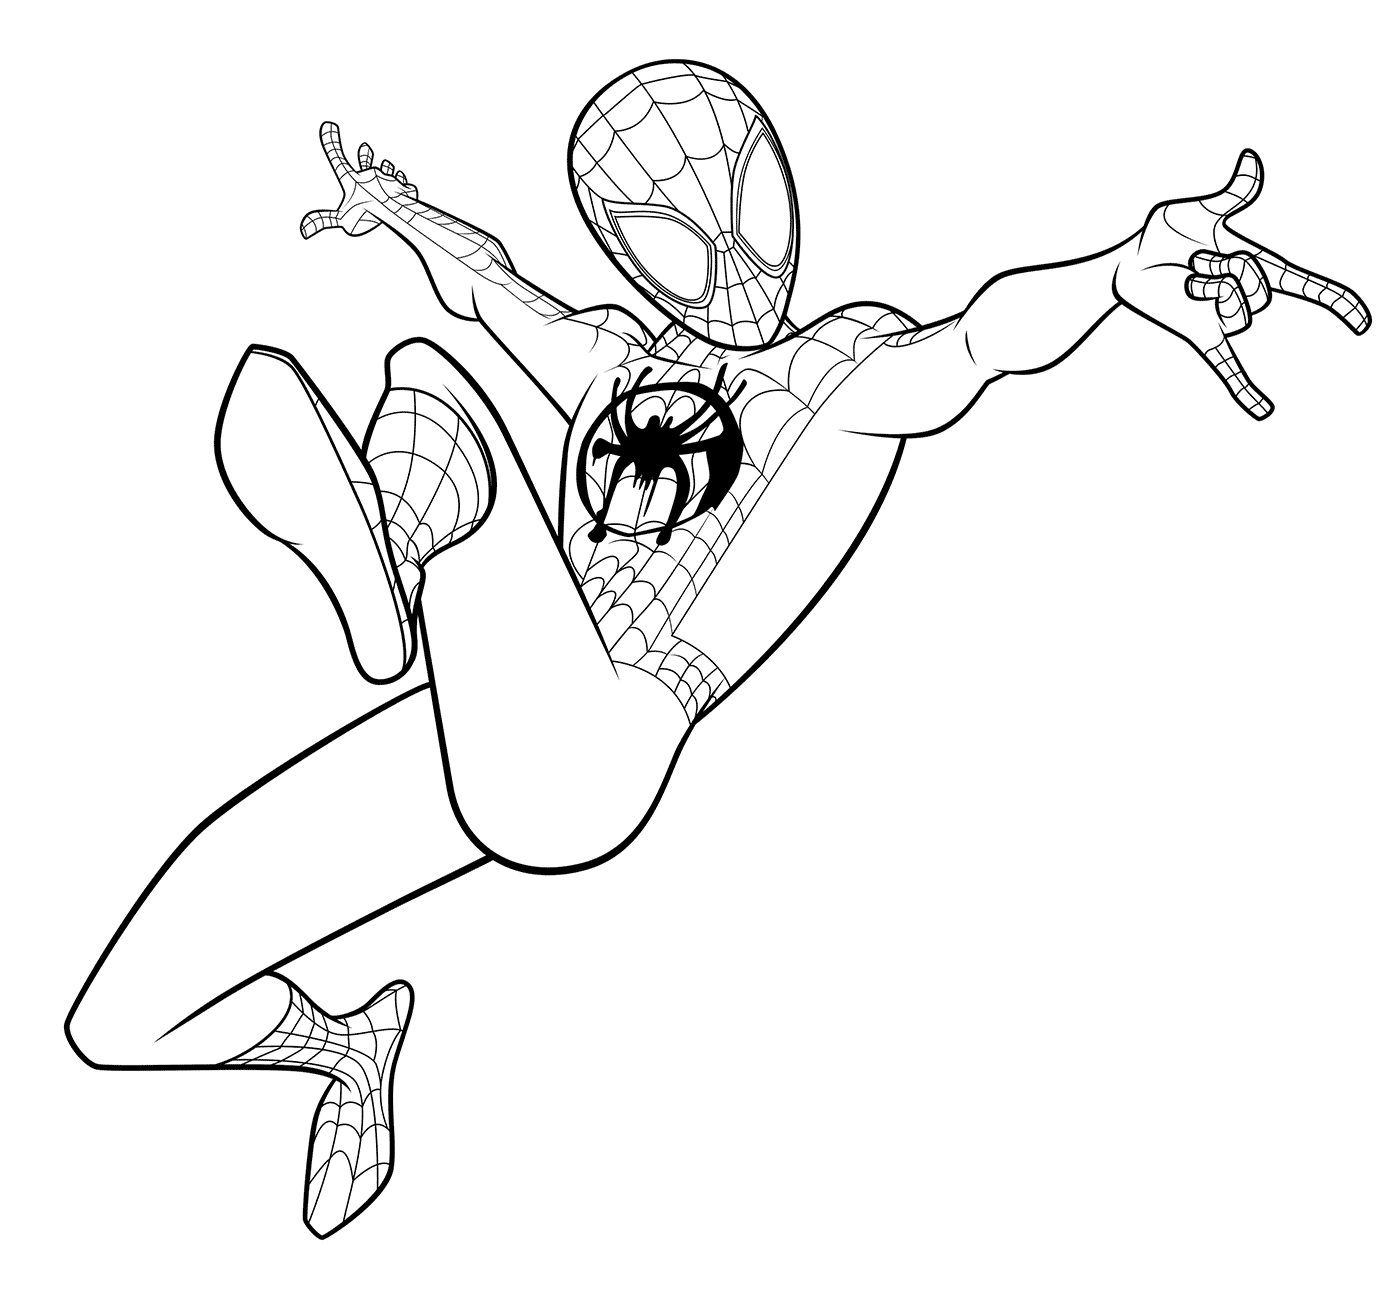 Miles Morales Spiderman Coloring Page Spiderman Coloring Miles Morales Spiderman Miles Morales